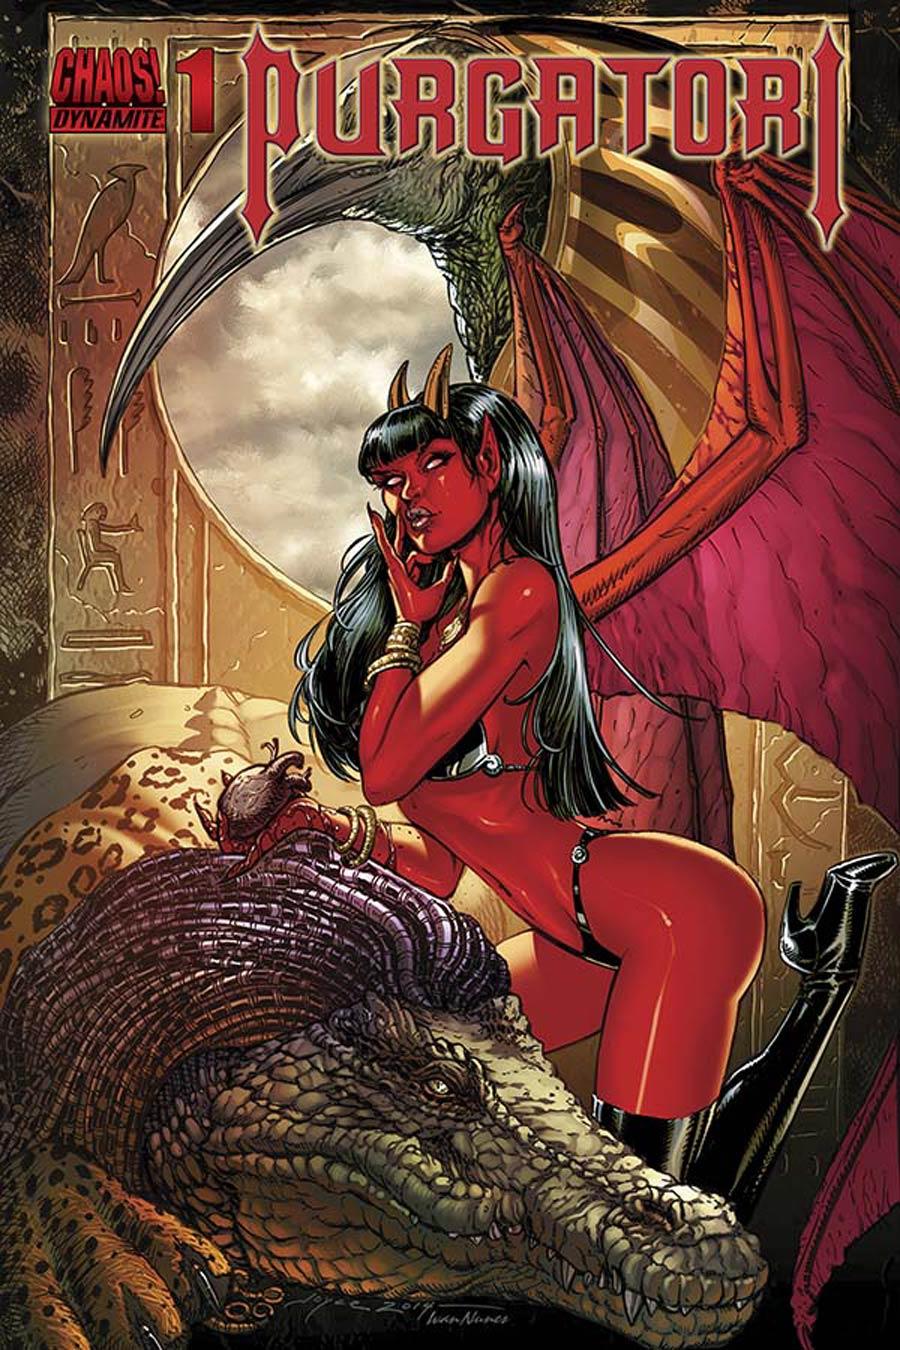 Purgatori Vol 3 #1 Cover B Variant Joyce Chin Cover